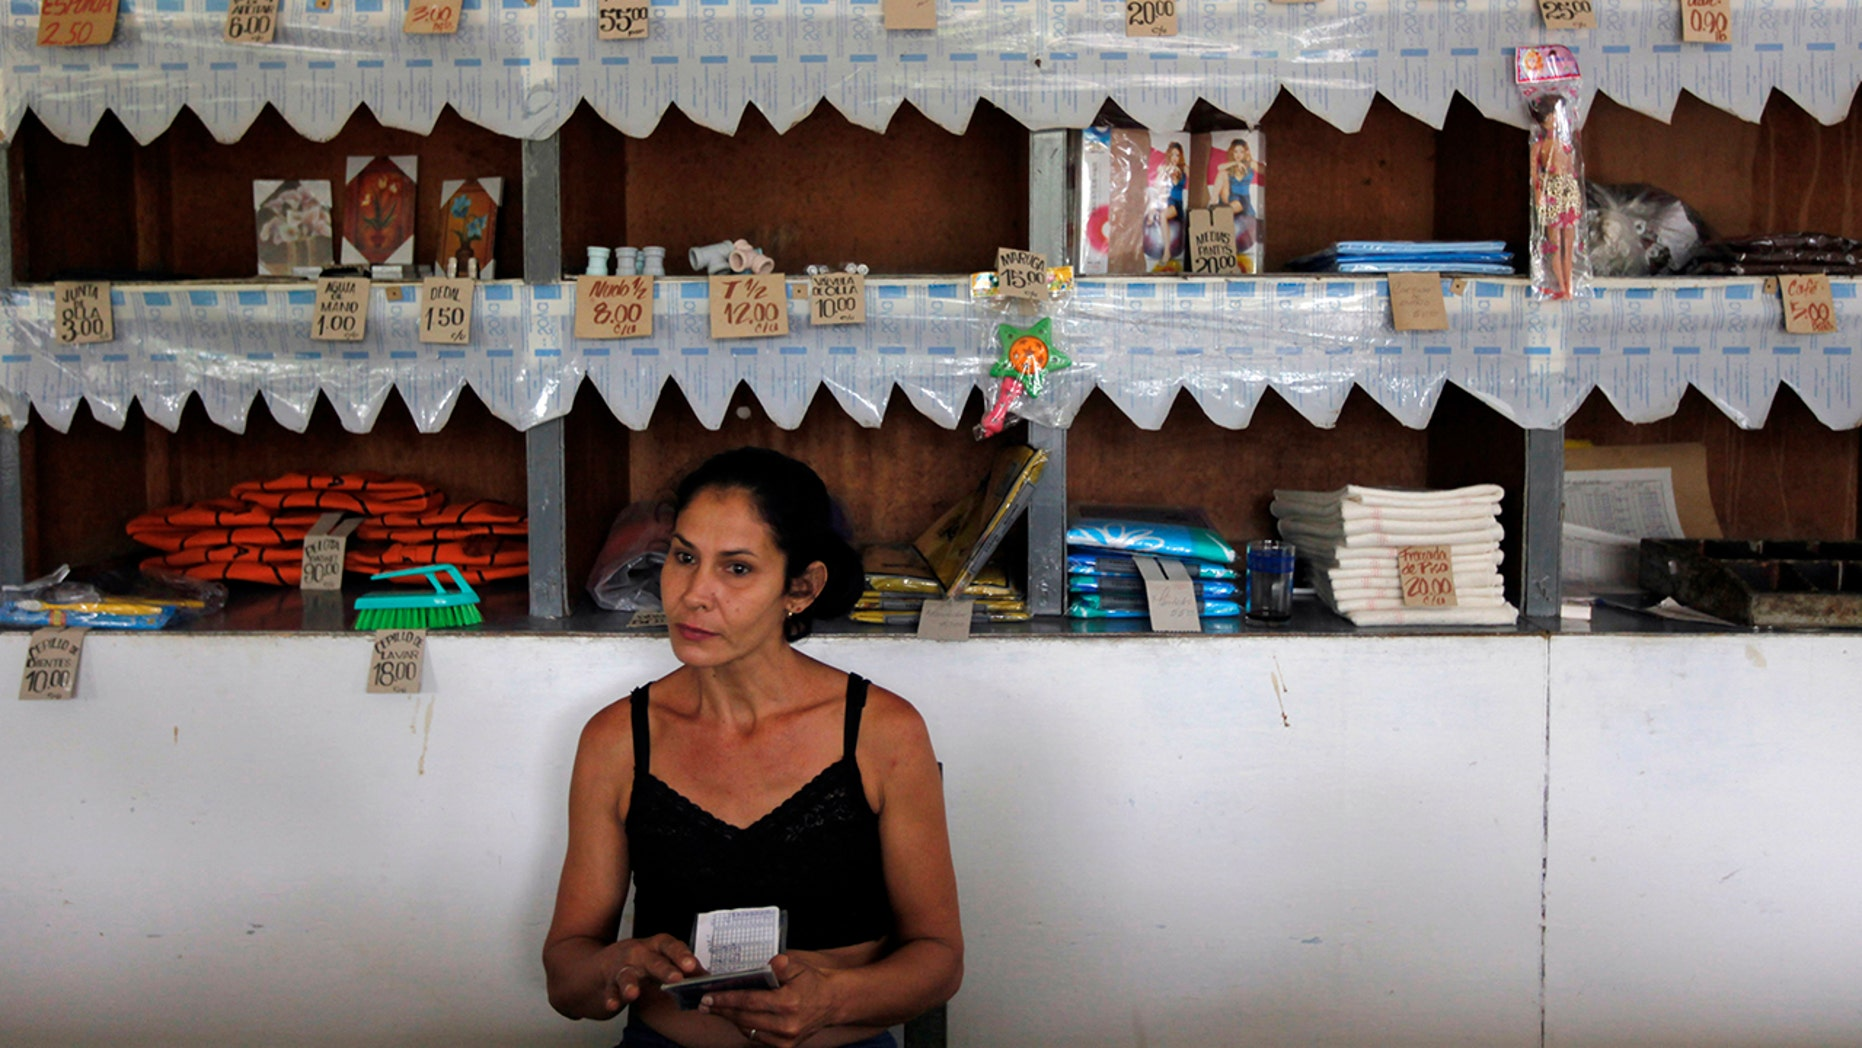 "A worker holds a rationing booklet at a government-run food store called ""Bodega"" in Sagua La Grande, Villaclara Province, central Cuba November 8, 2009. REUTERS/Desmond Boylan (CUBA SOCIETY FOOD)"